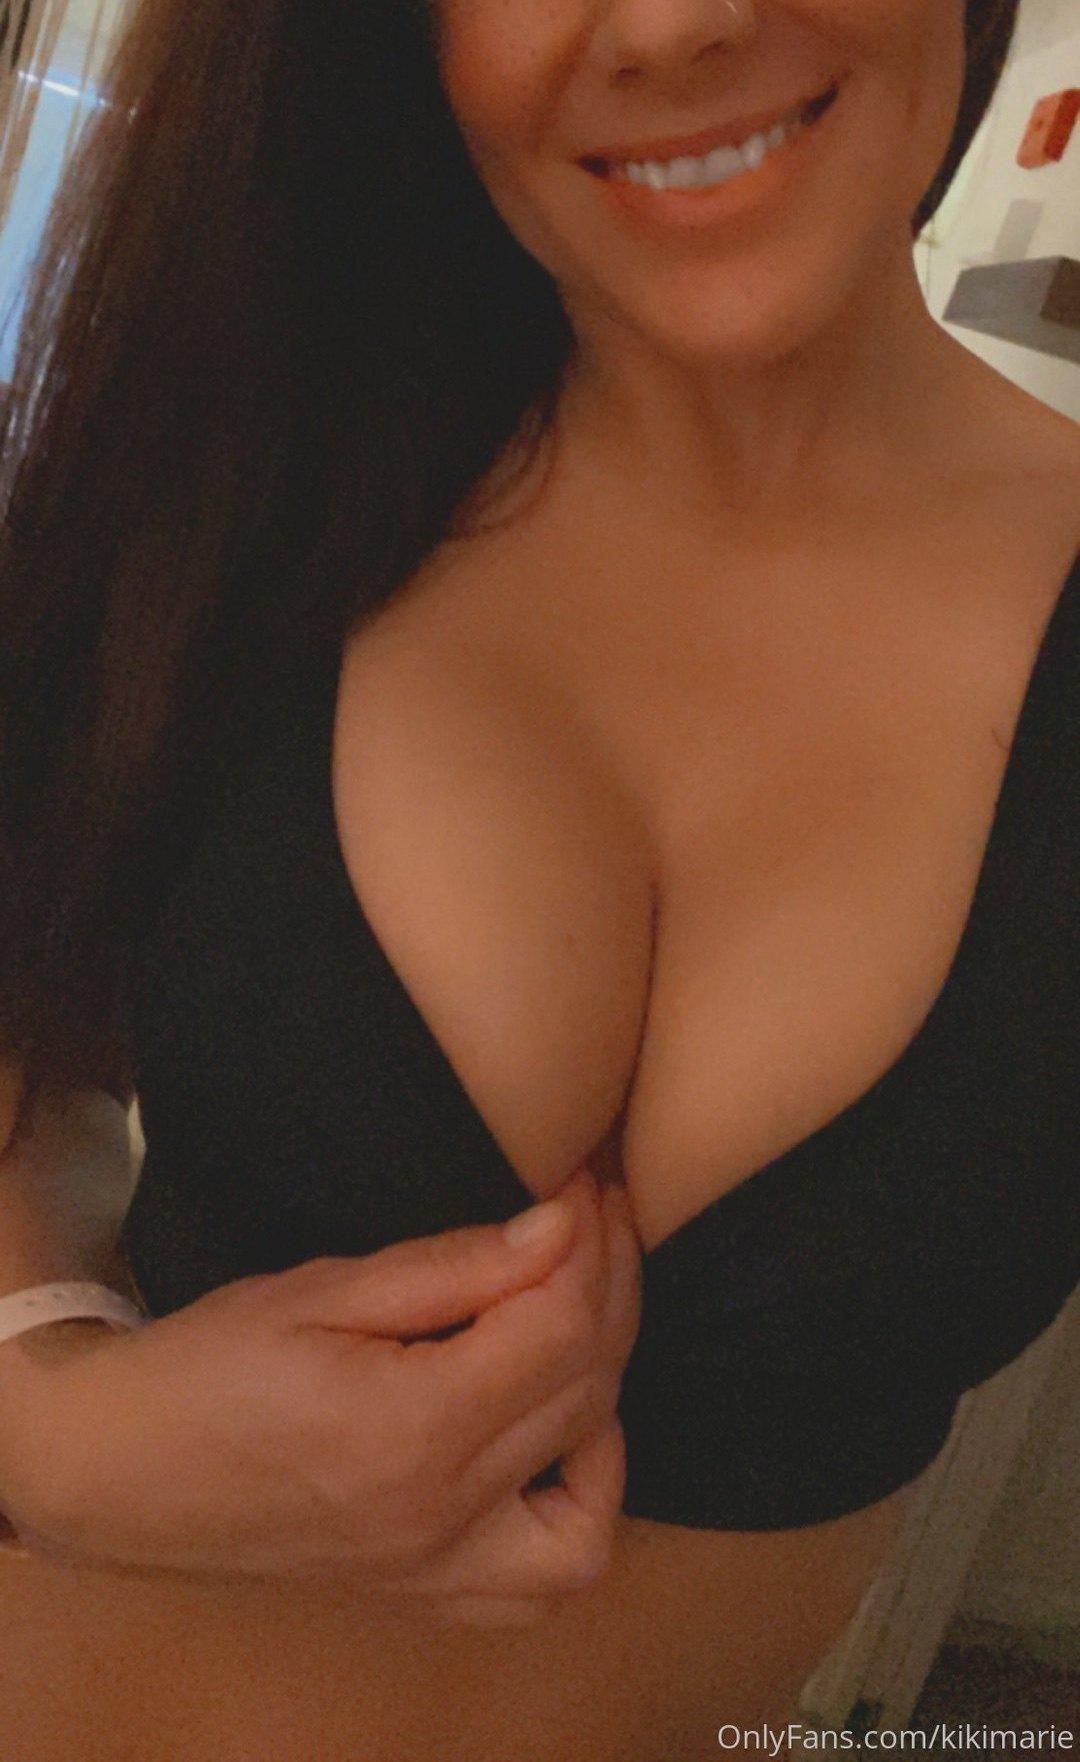 Kiki Marie Kikimarie Onlyfans Nudes Leaks 0002